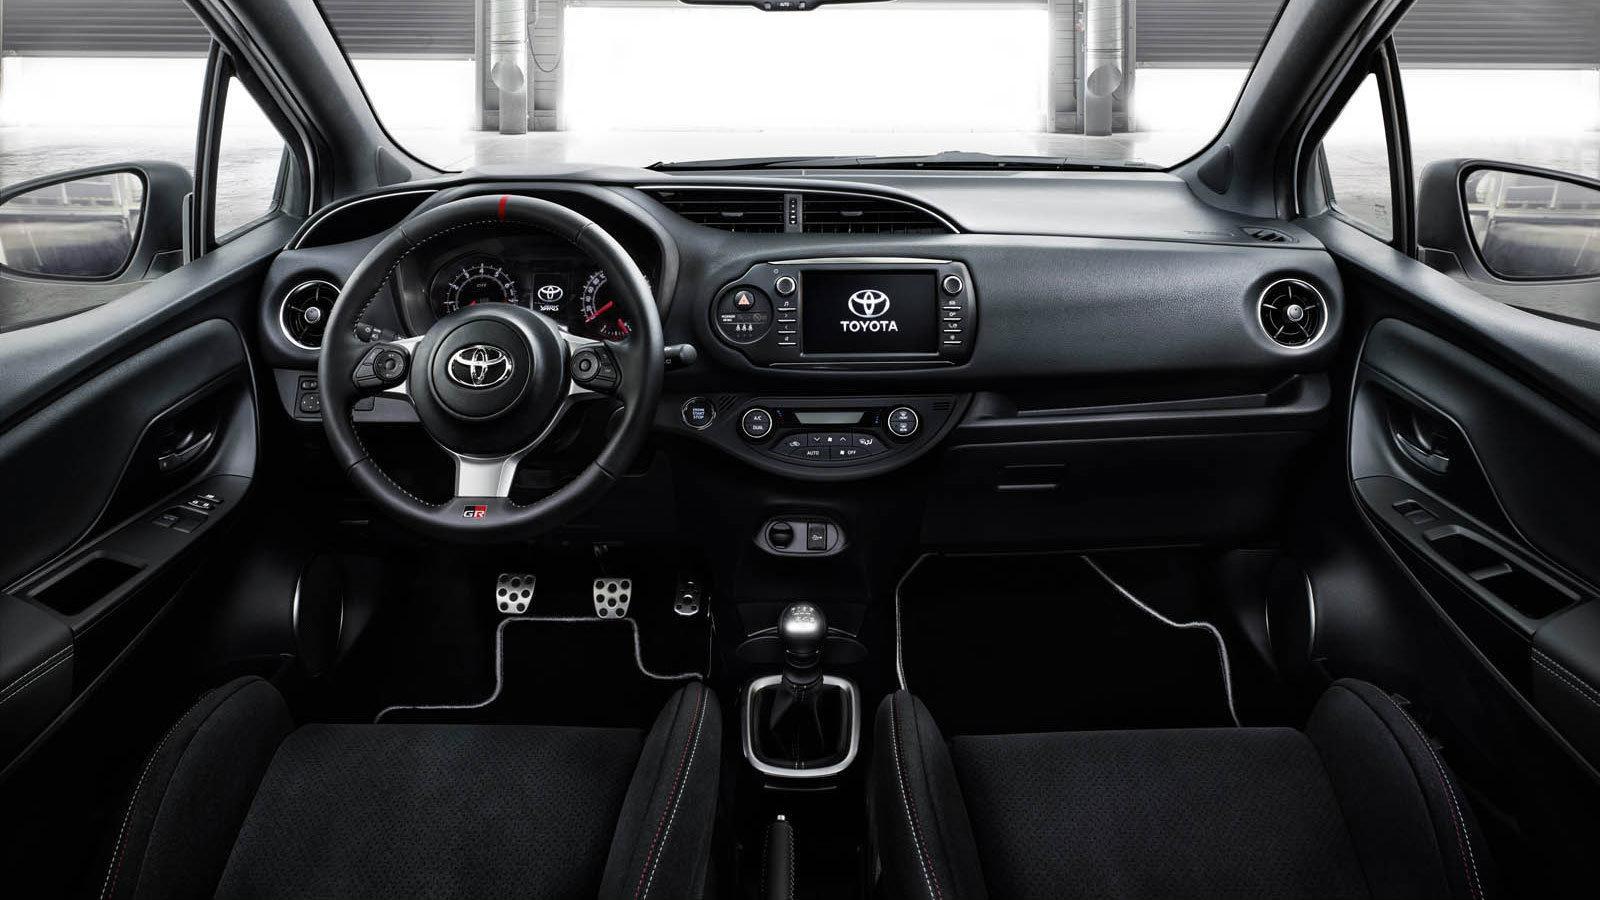 Toyota yaris 210 ps toyota yaris for Interieur yaris 2017